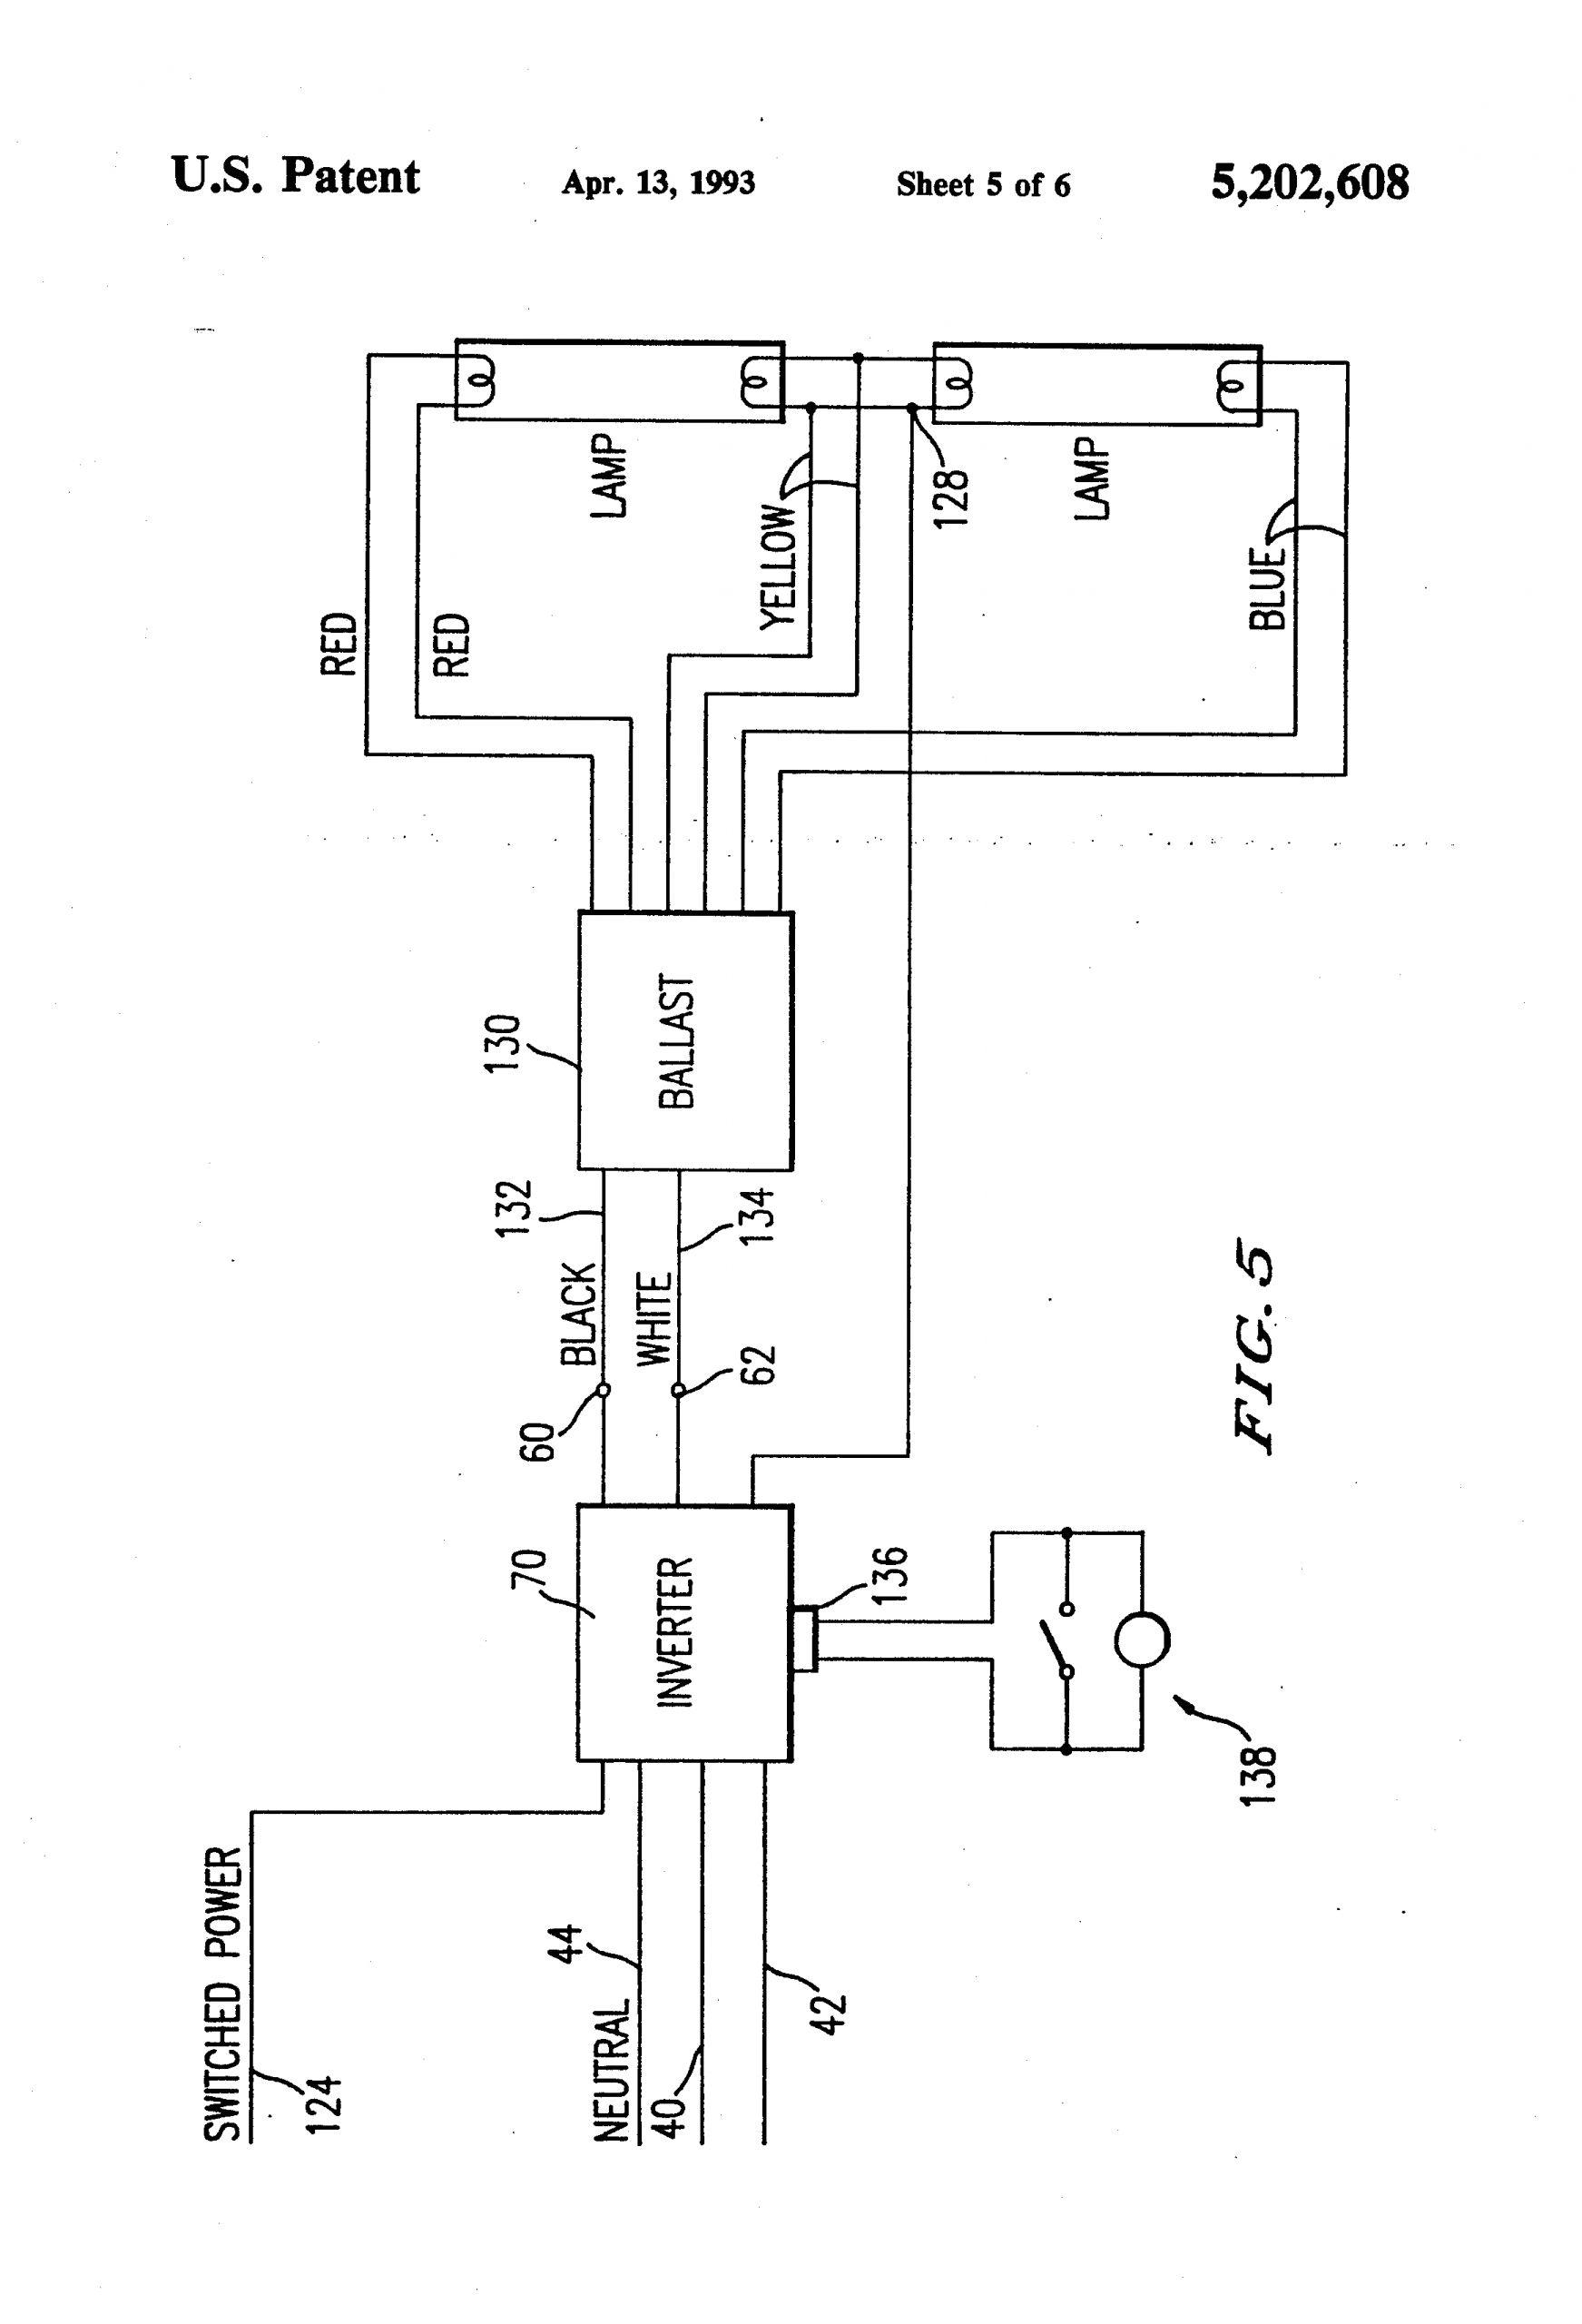 Bodine B50 Wiring Diagram Fbp 1 40x Wiring Diagram 2001 Ram 1500 Engine Wiring Diagram